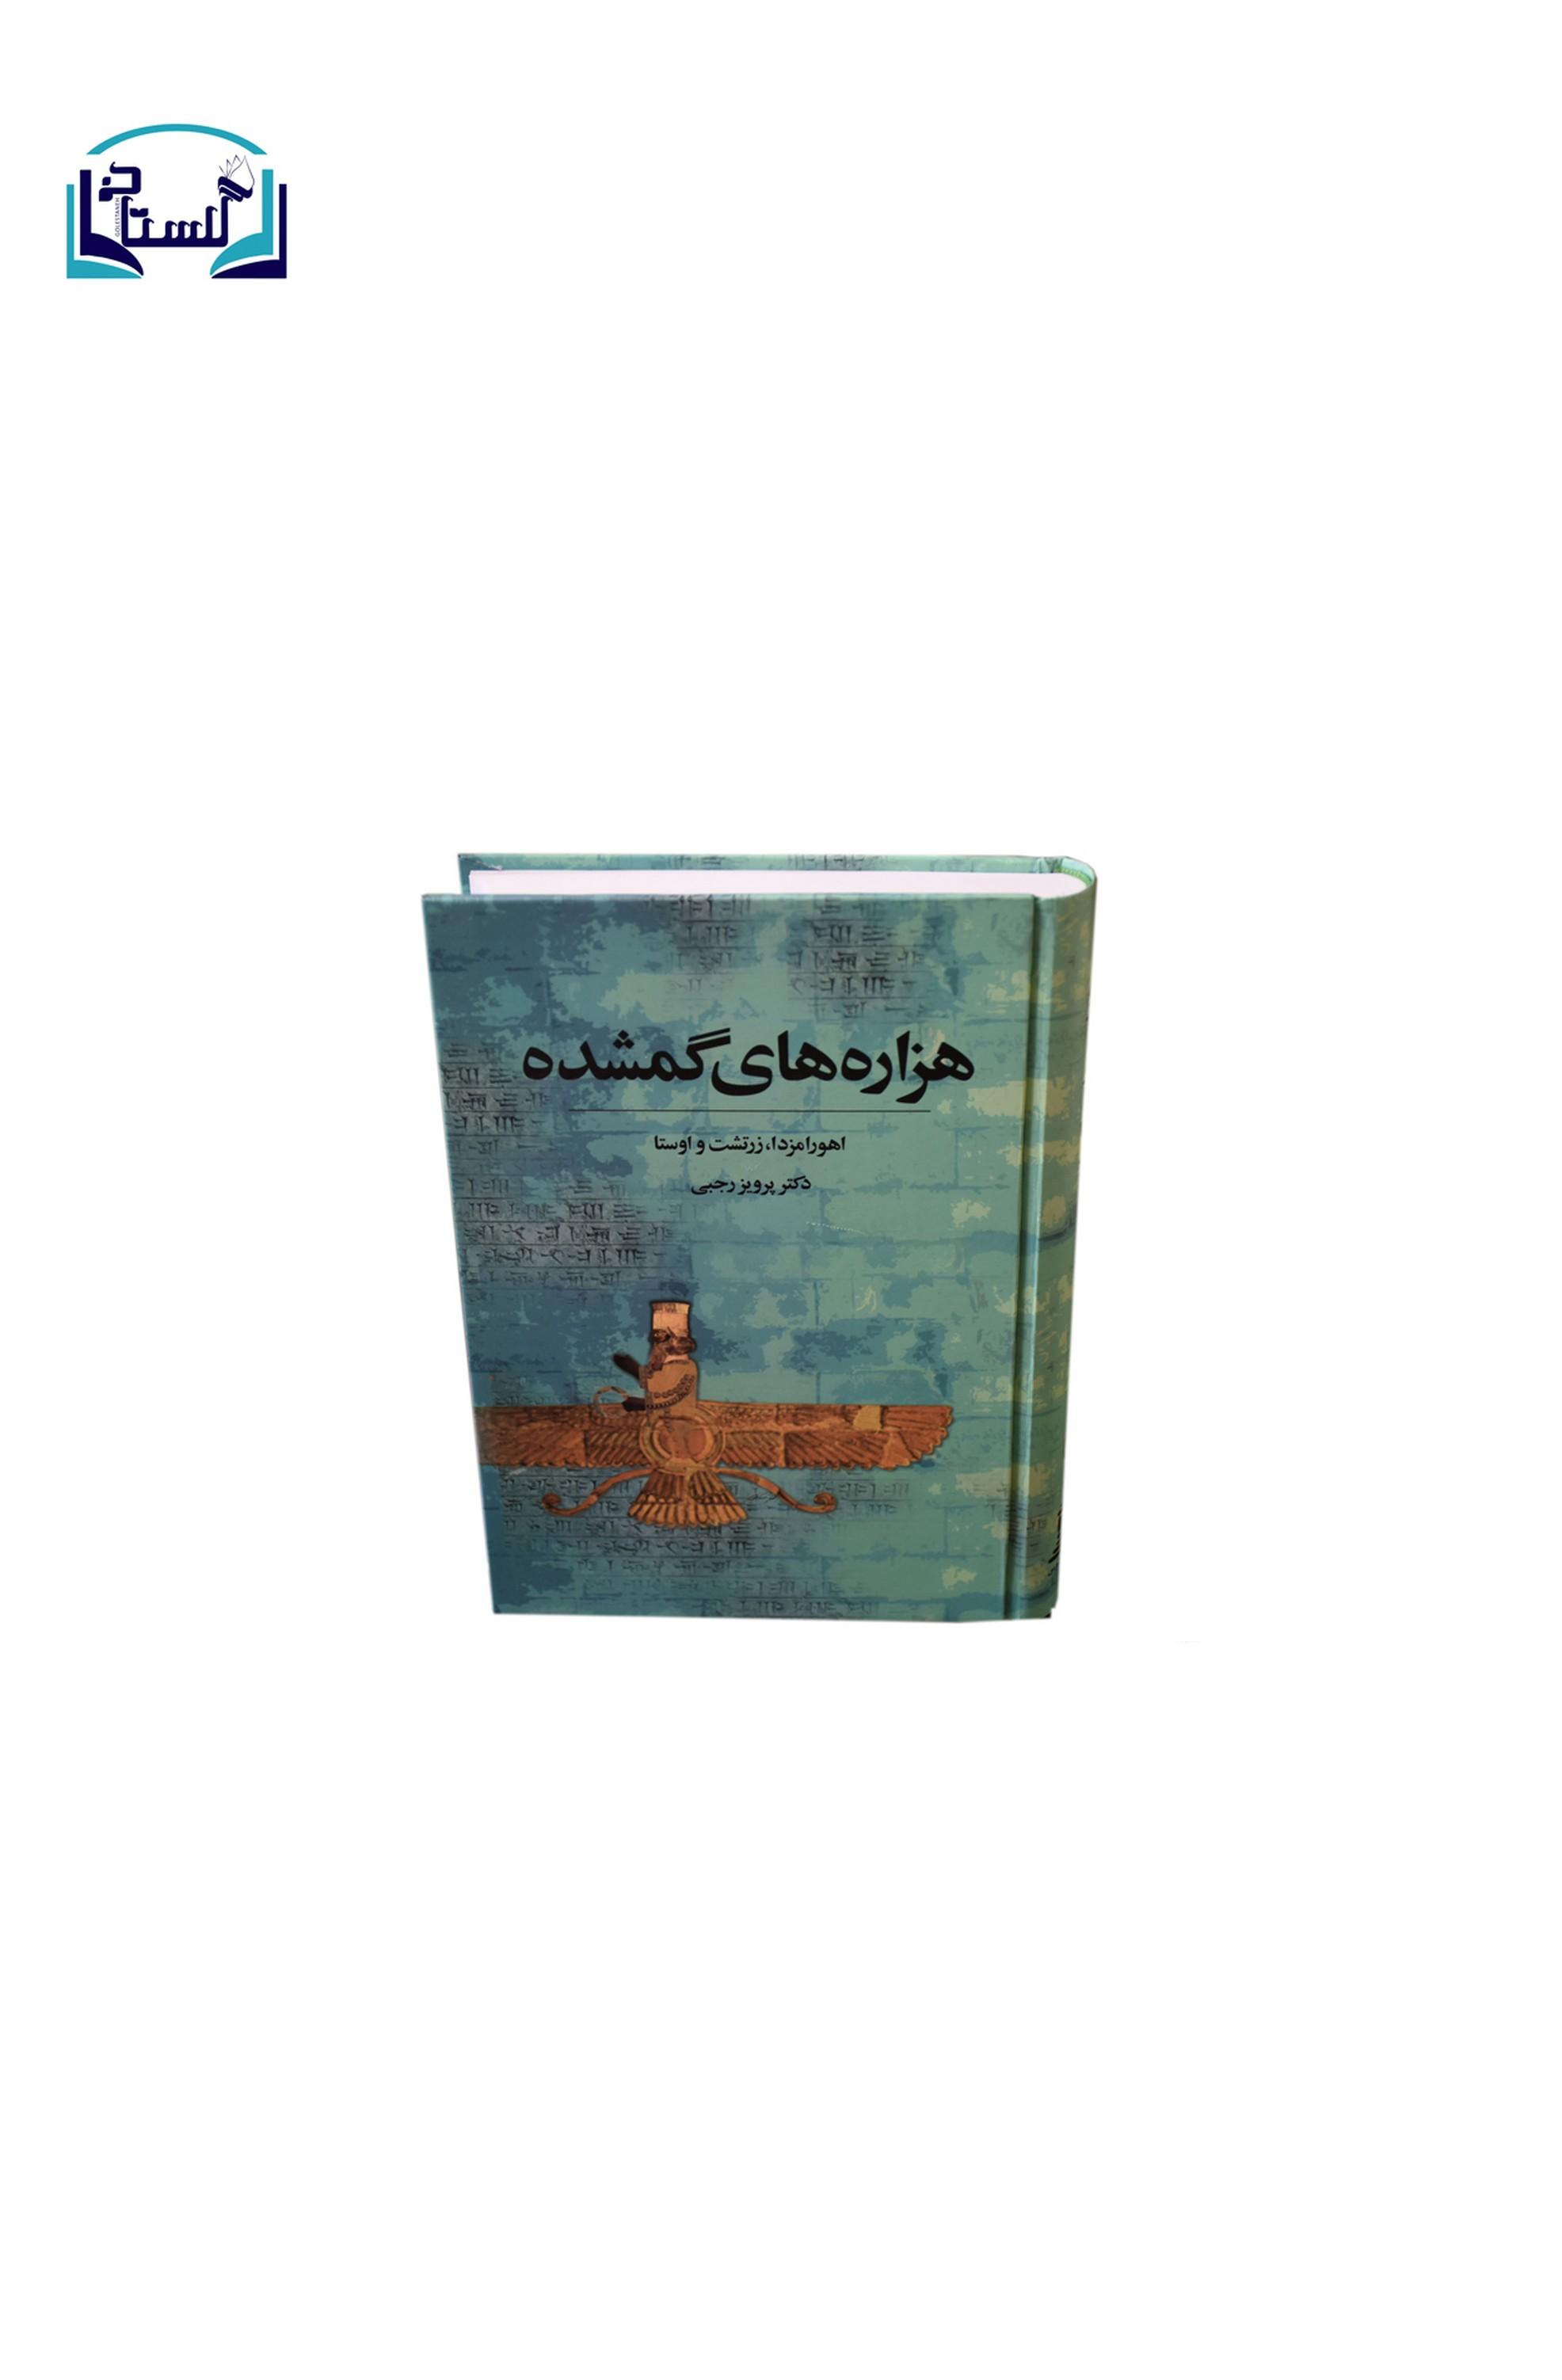 هزاره-هاي-گمشده5جلدي(توس)وزيري-سلفون